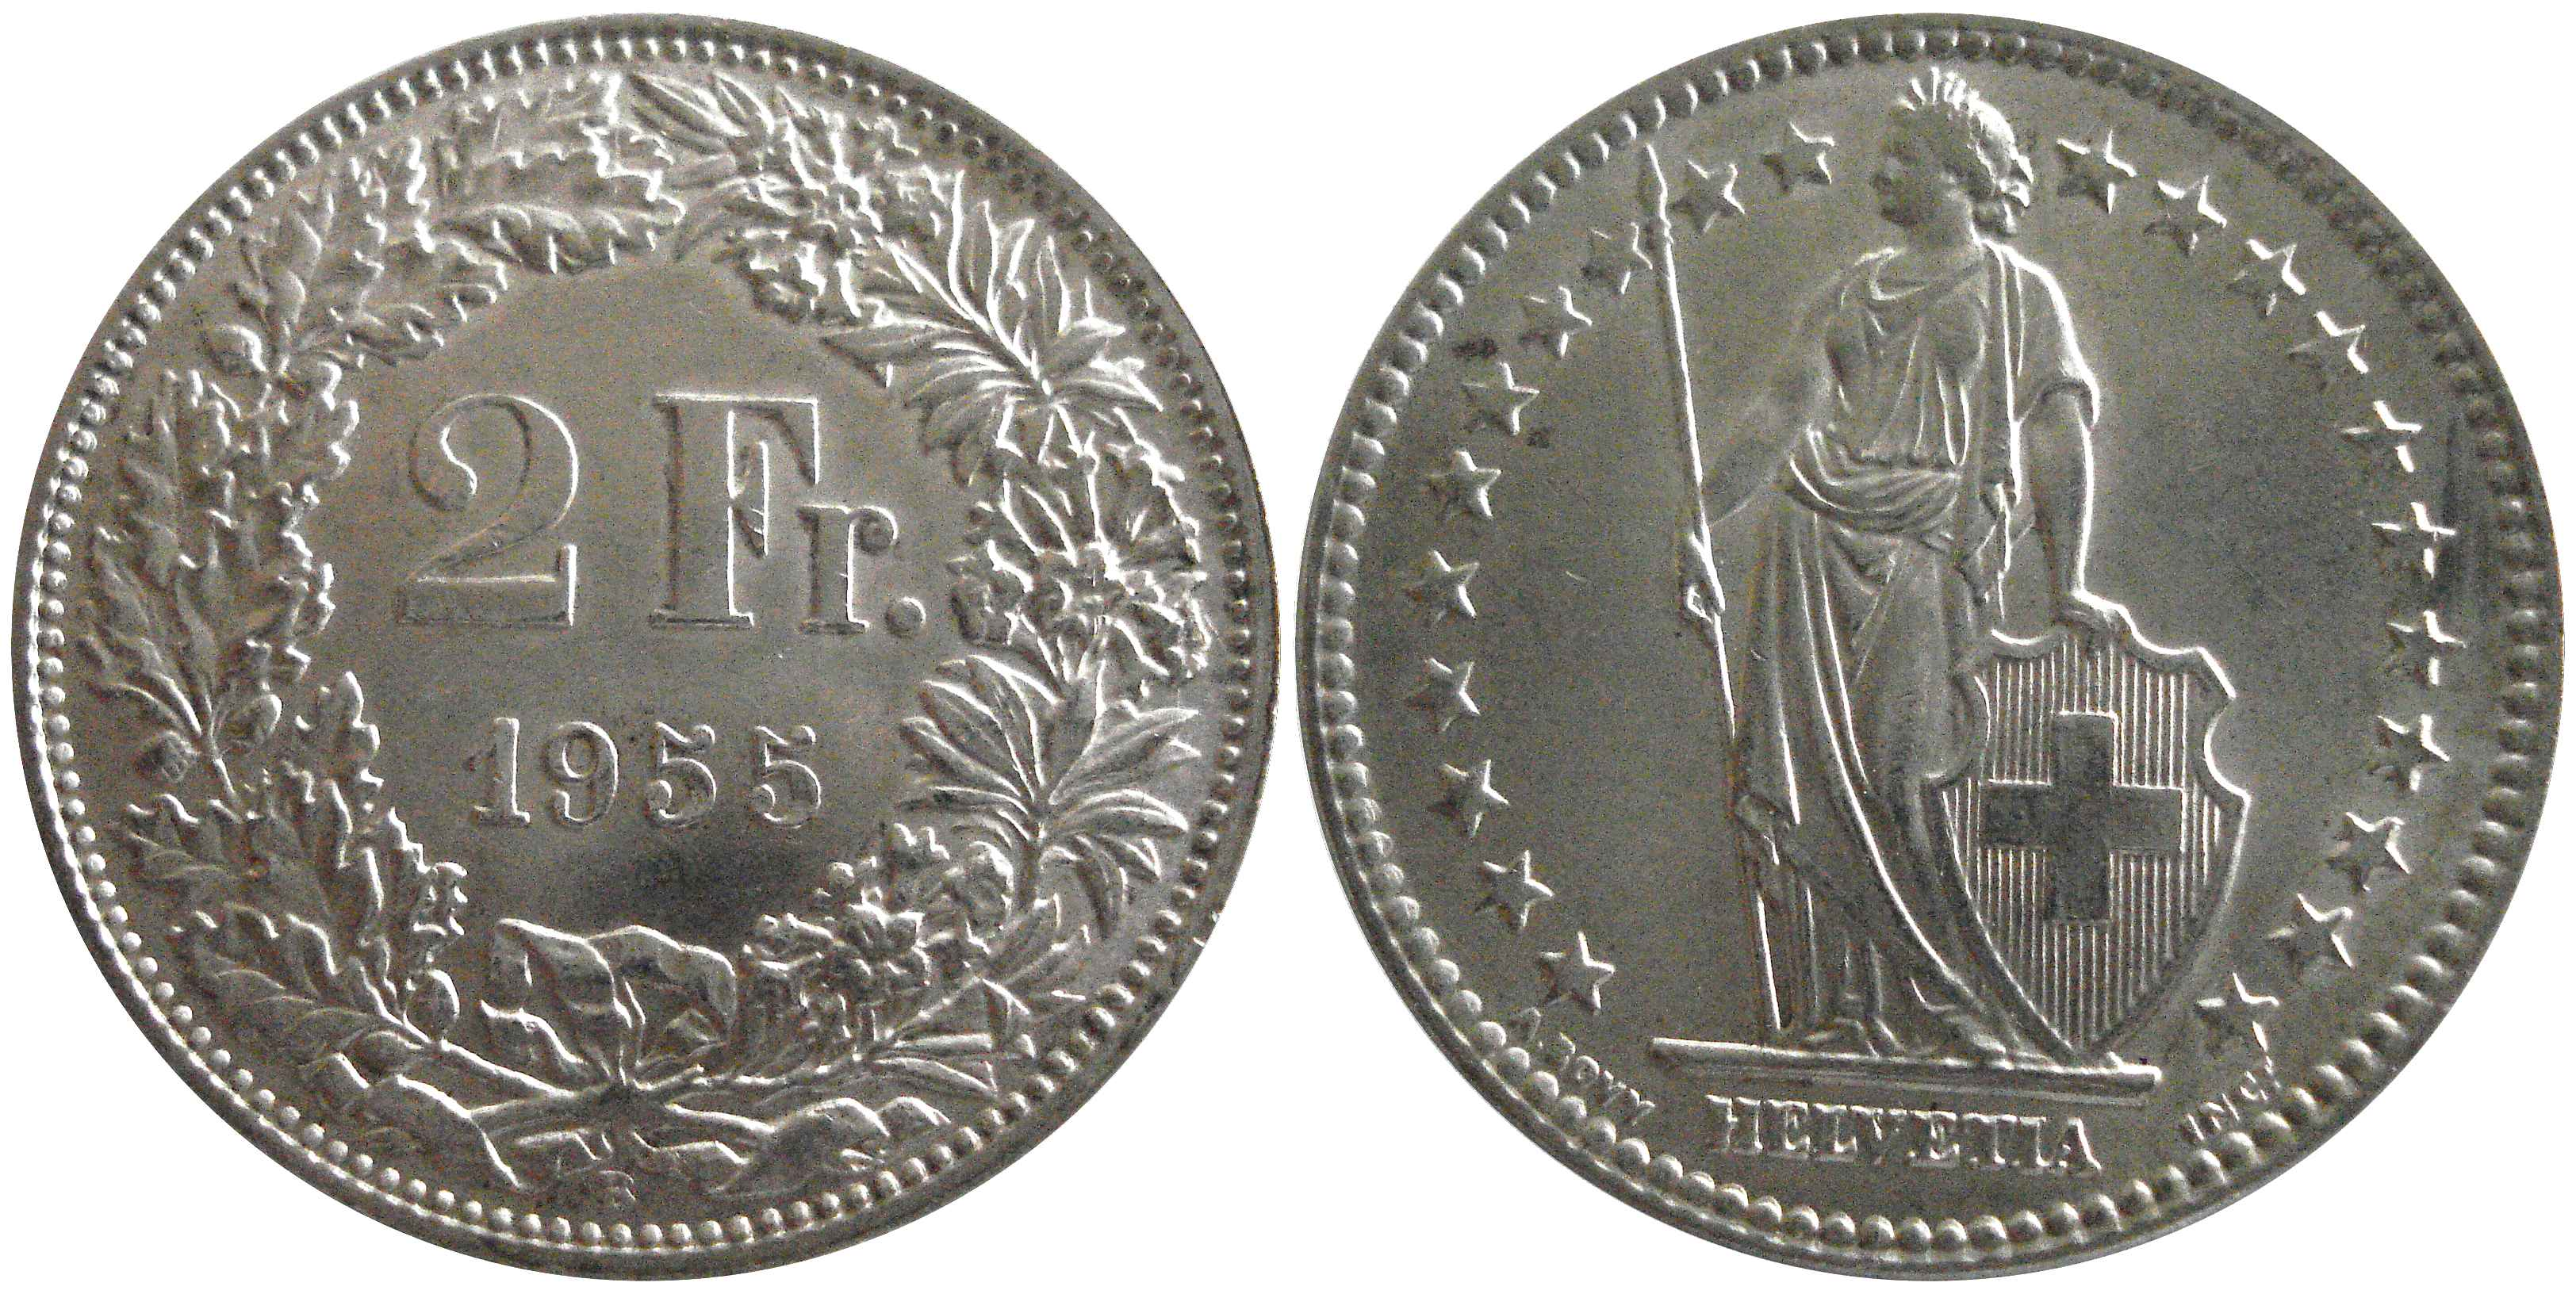 Swiss 2 Franc Coin Currency Wiki Fandom Ed By Wikia